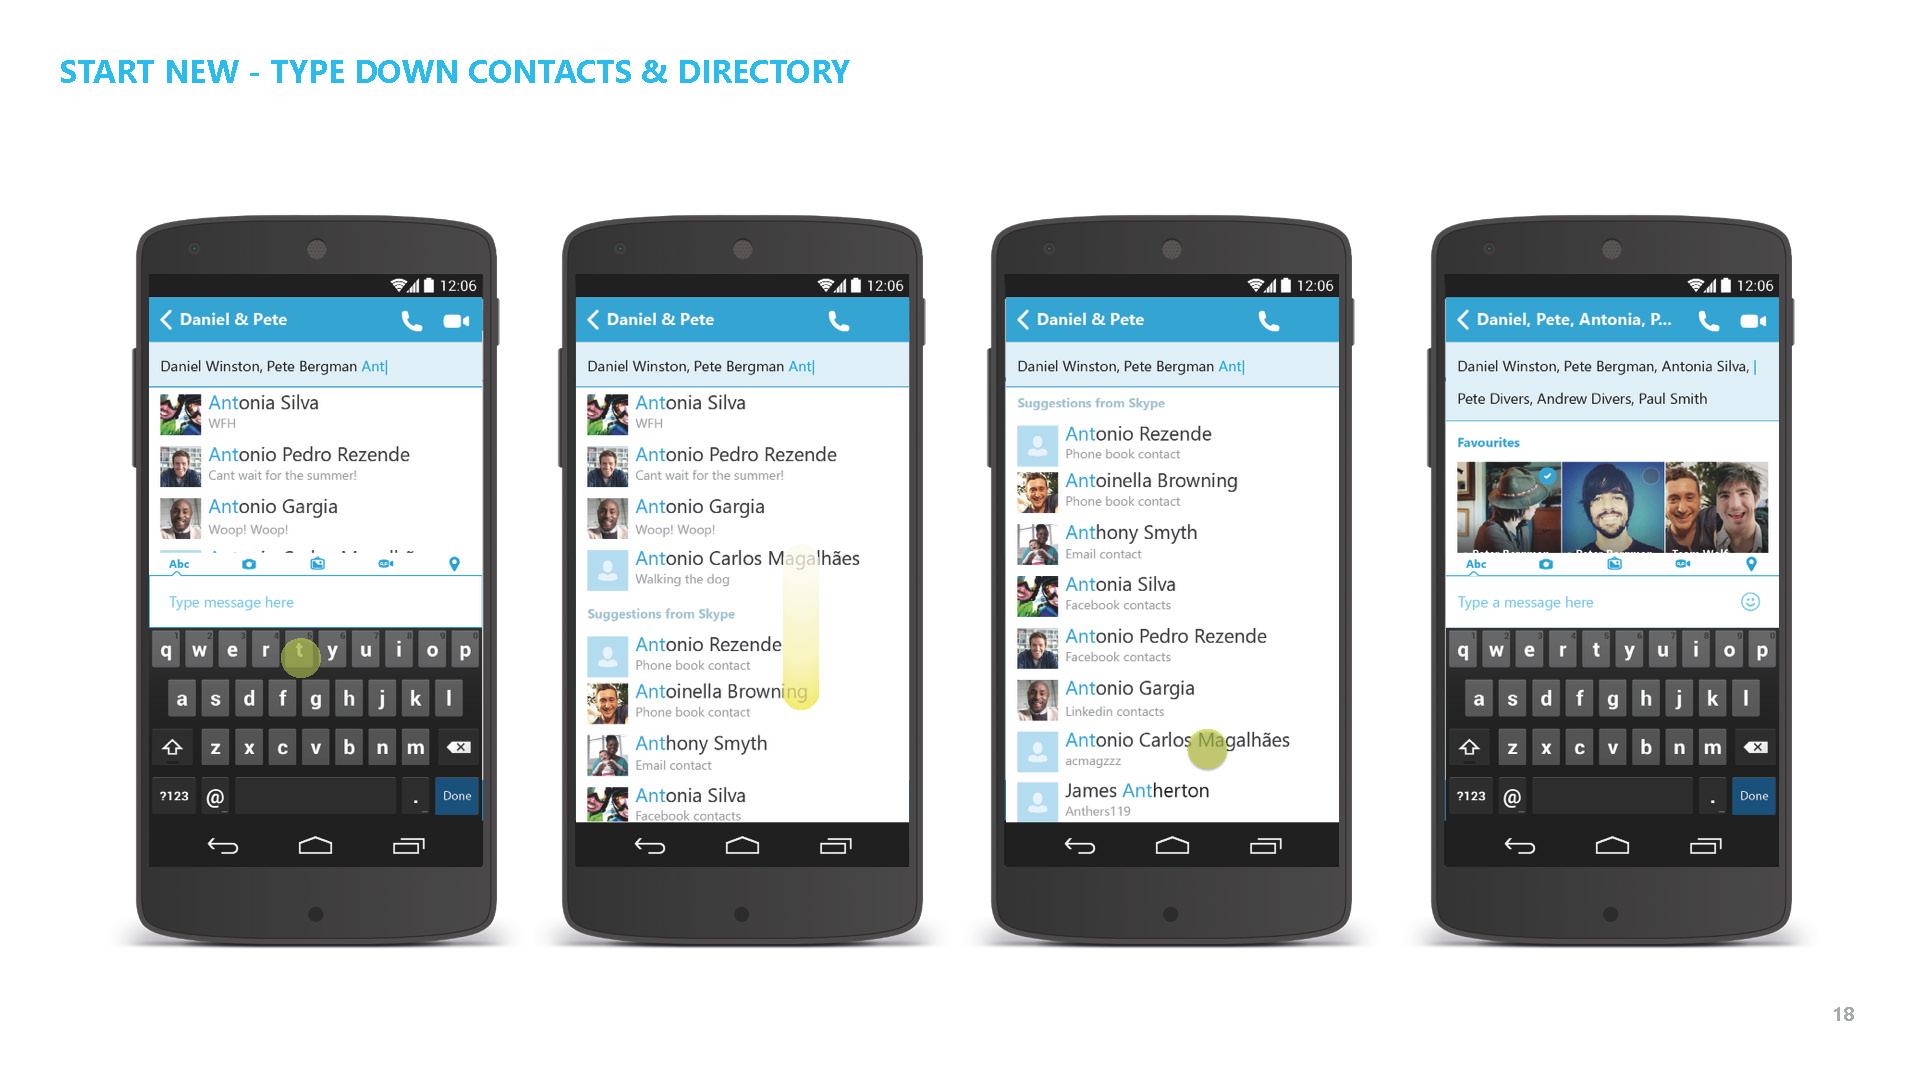 Mobile_UI_model_Page_18.jpg